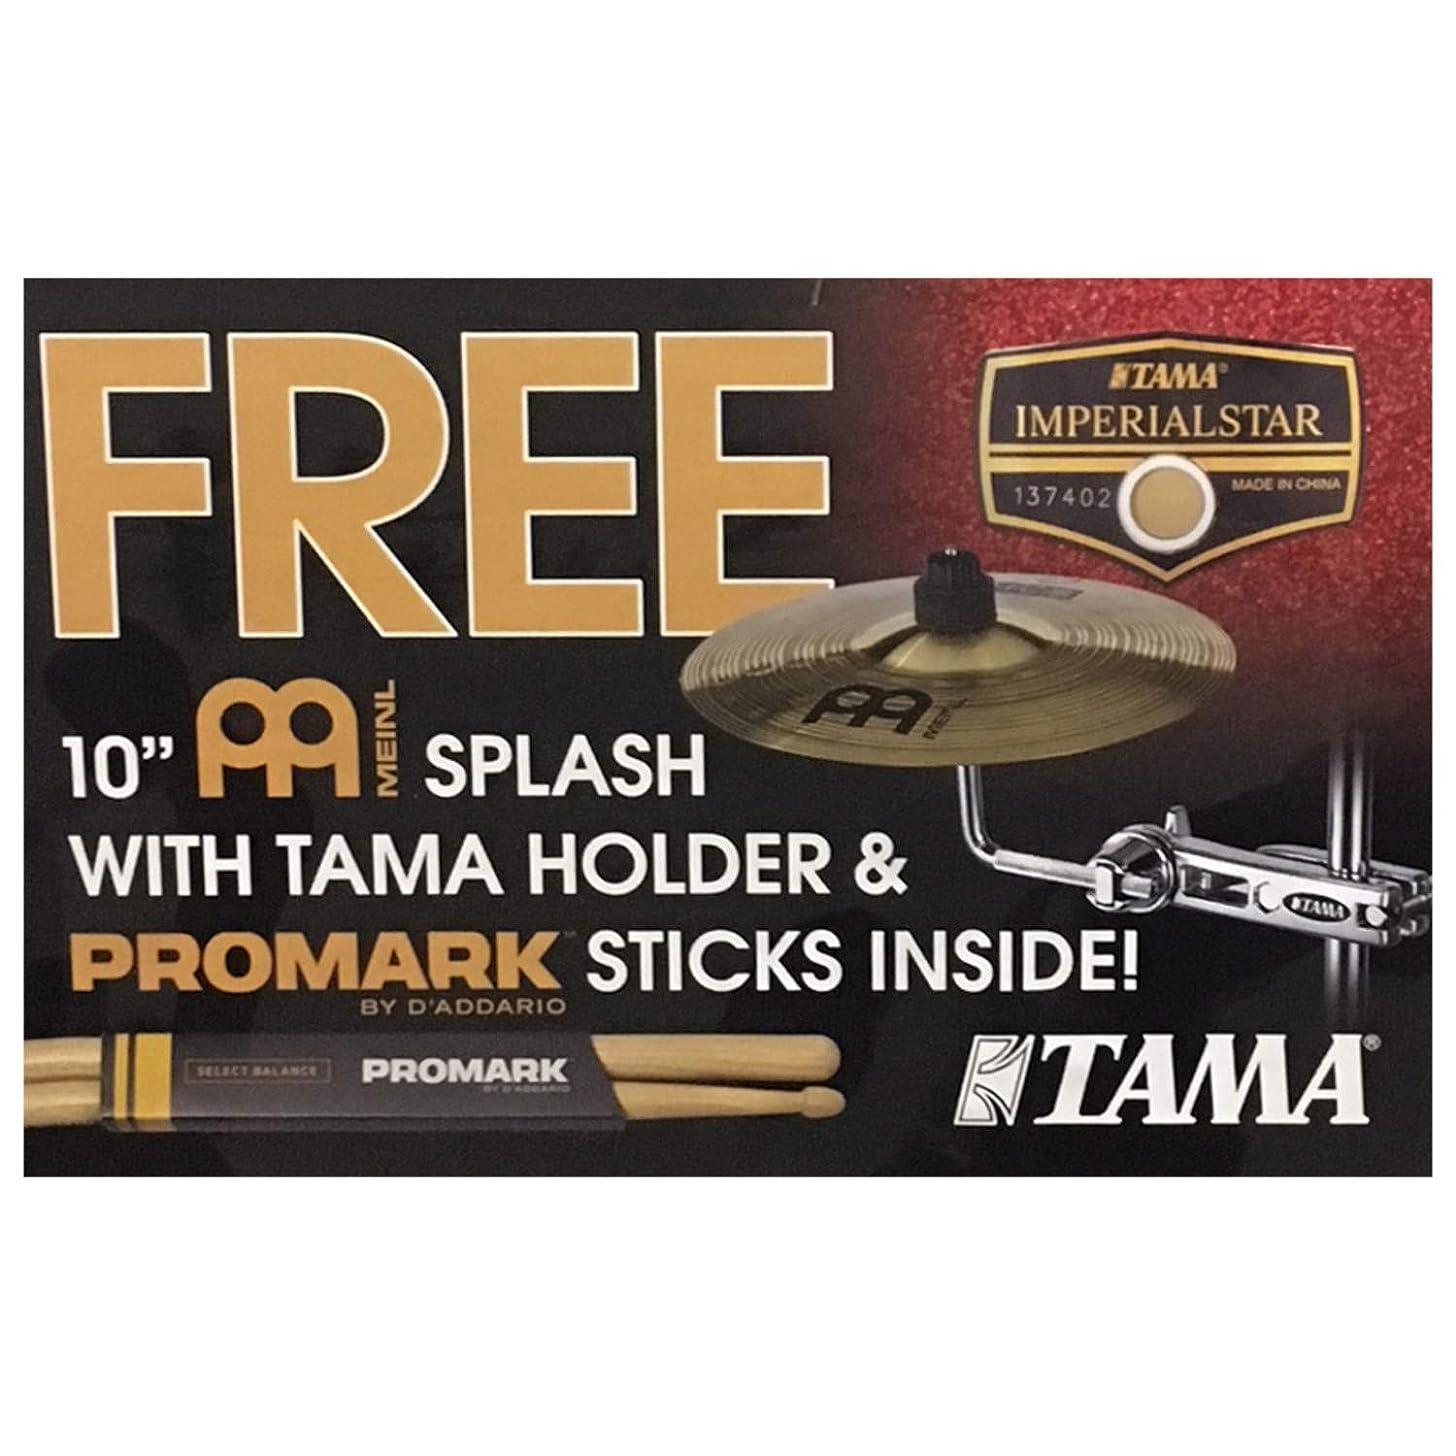 Tama Imperialstar Add-On Meinl 10 Inch Splash Cymbal w/Holder and Pro-Mark Stic